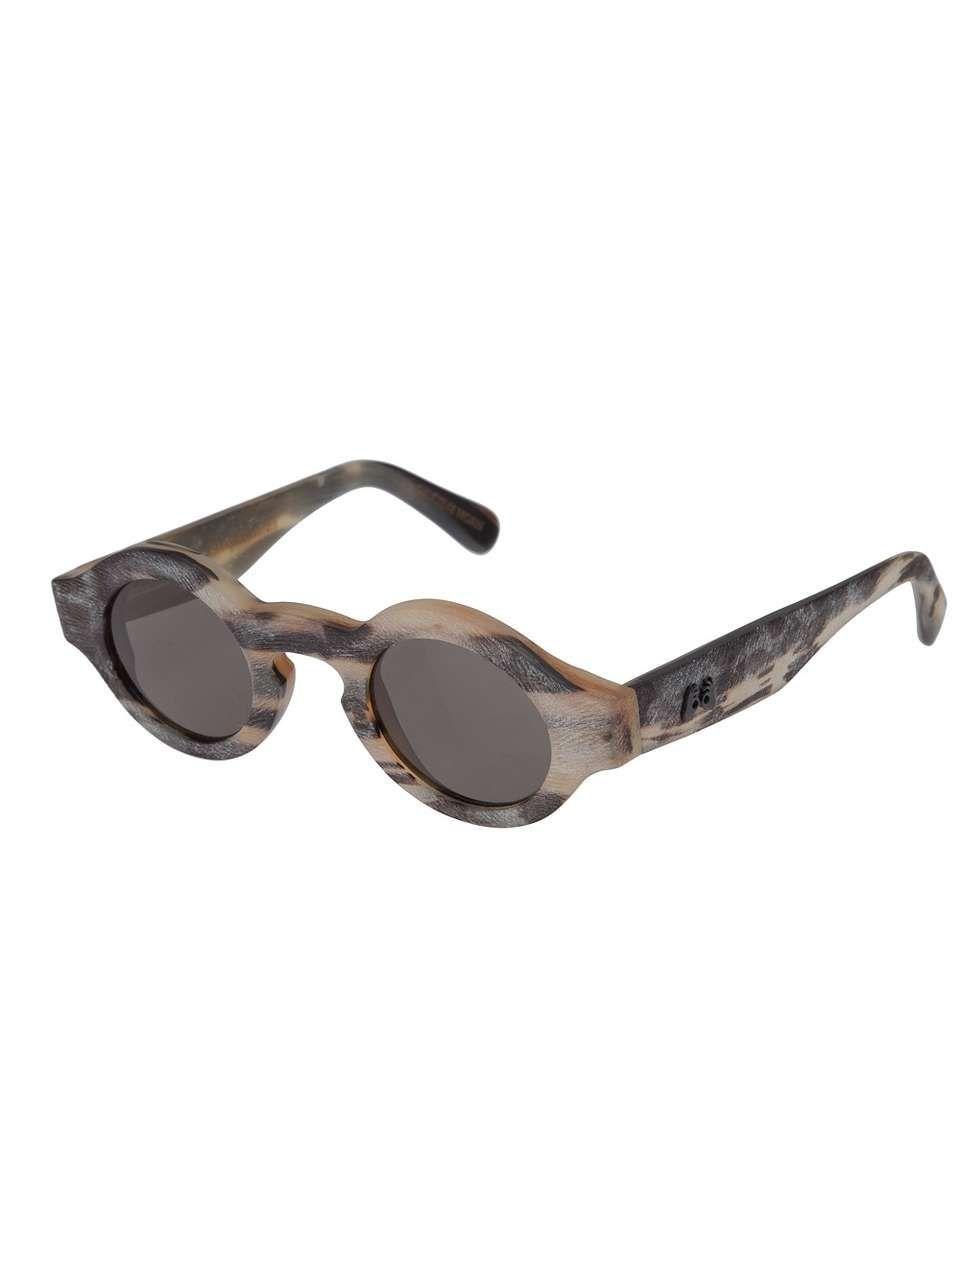 Rigards round frame sunglasses | sunglasses | Pinterest